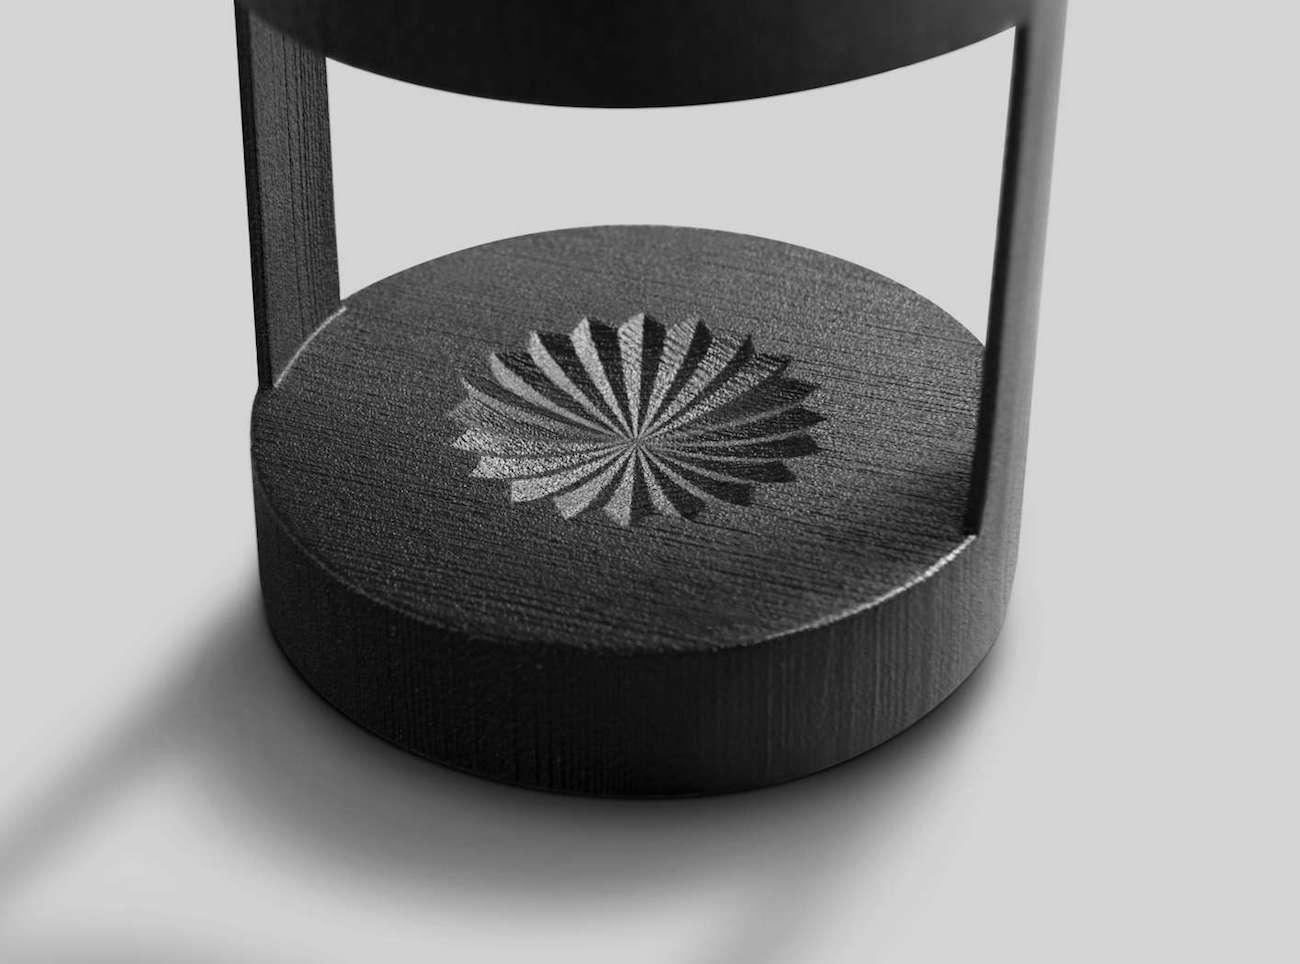 Othr Torq 3D-Printed Nutcracker